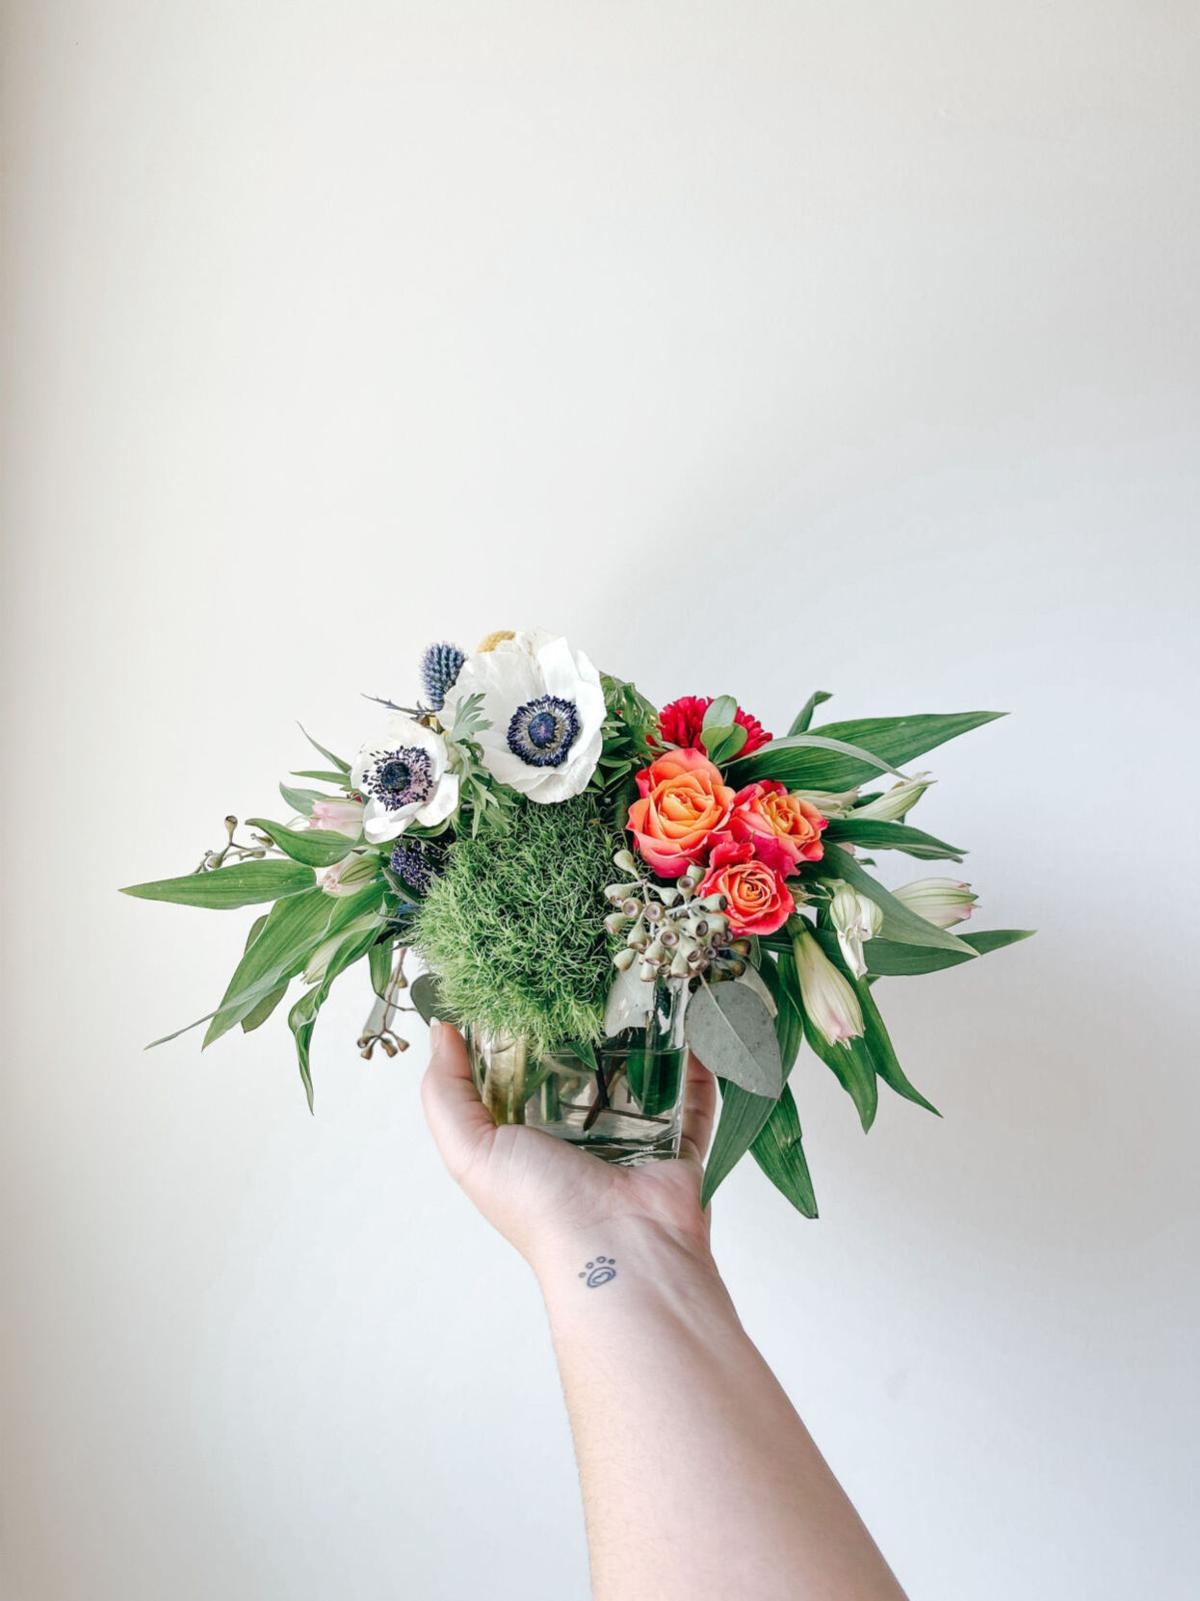 042921_flowers5